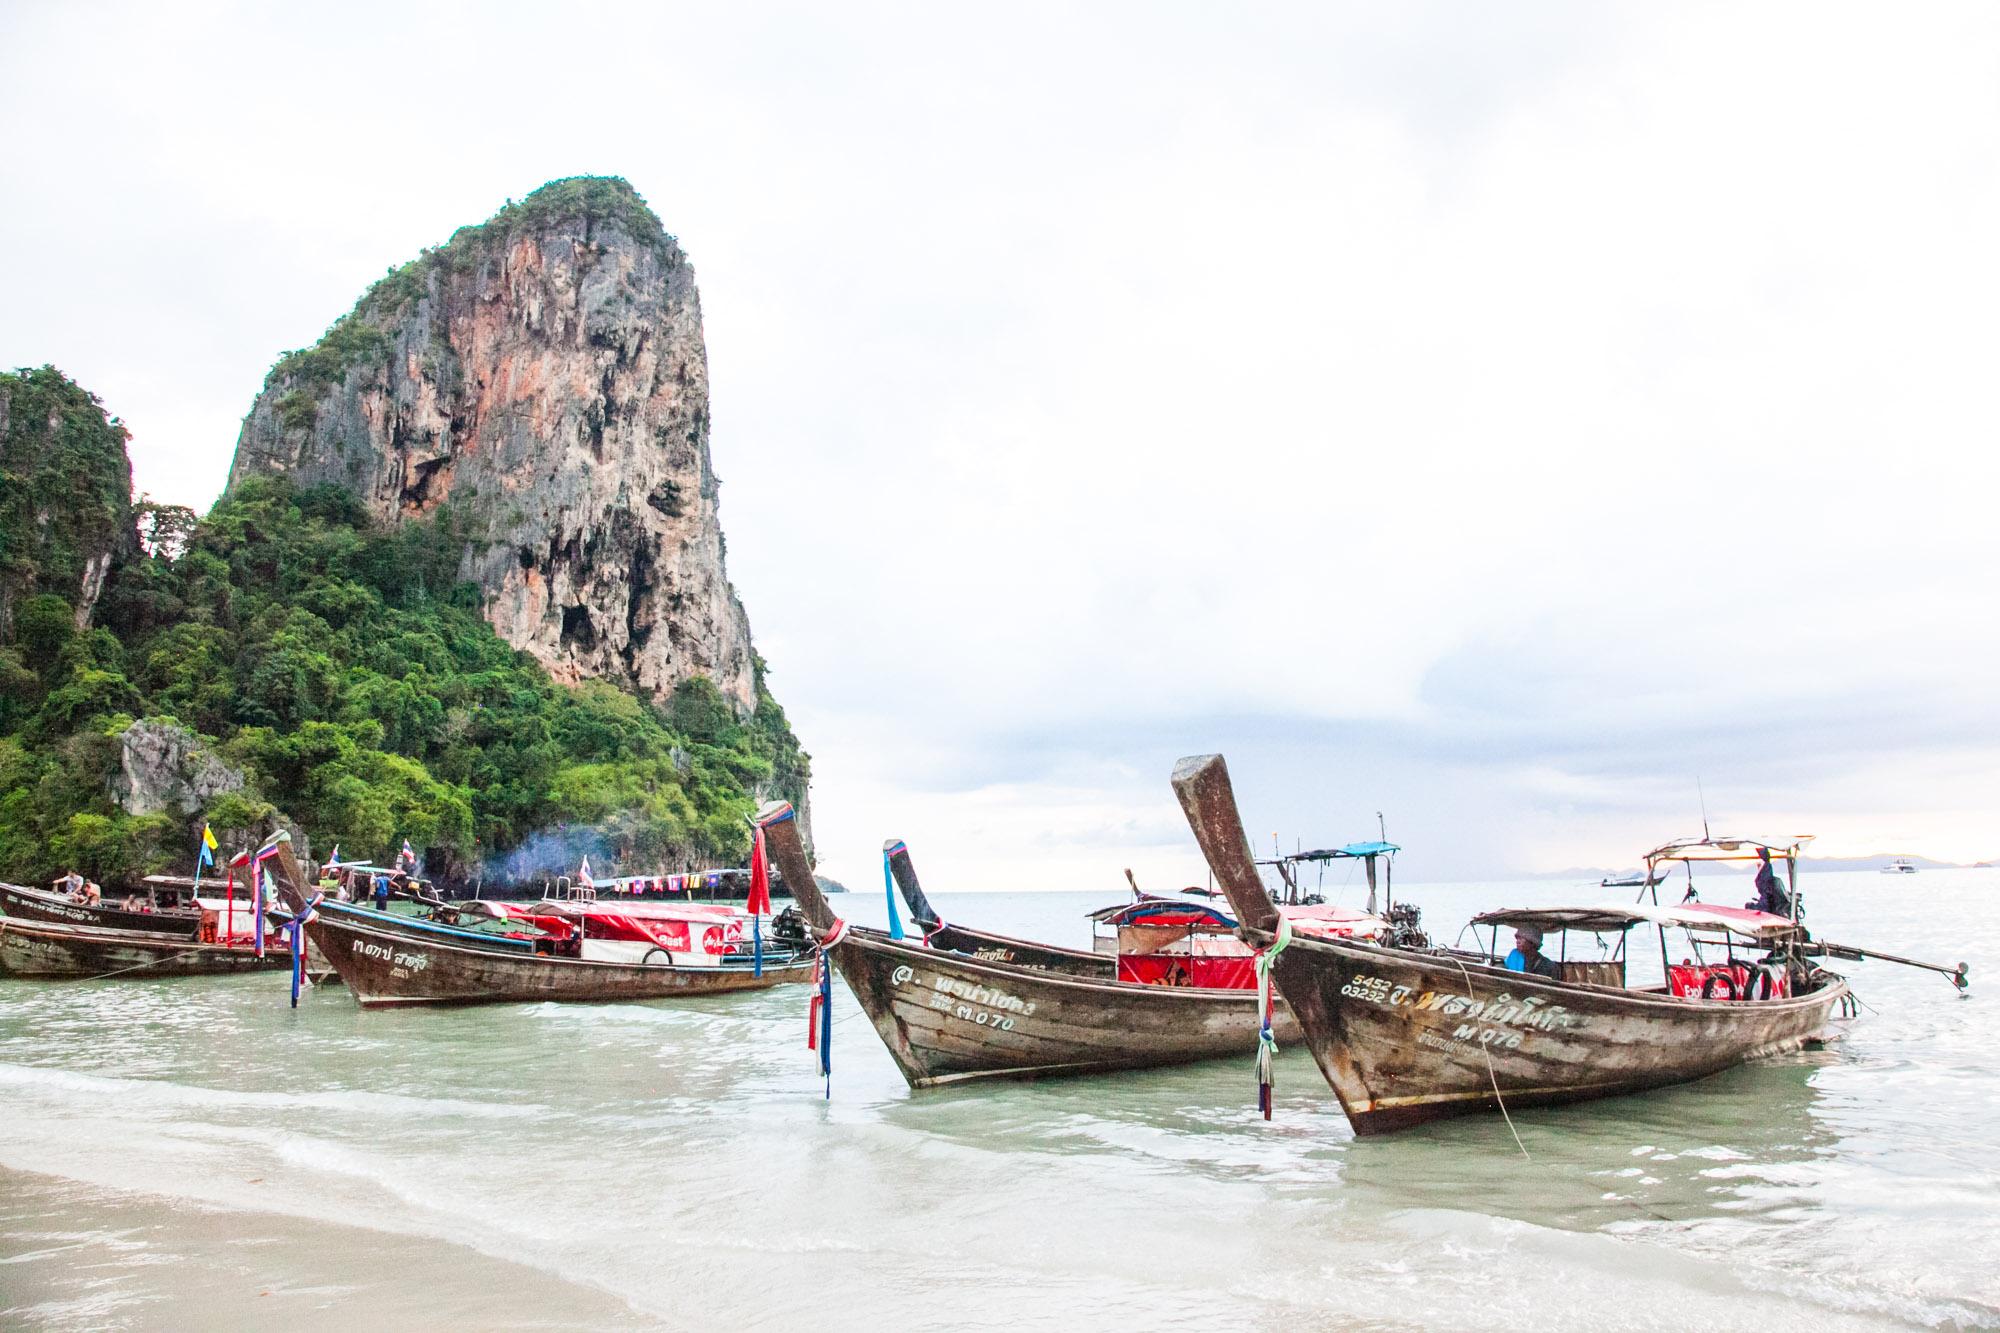 IMG_3639-railay-beach-thailand-traveling-trisa-taro.jpg